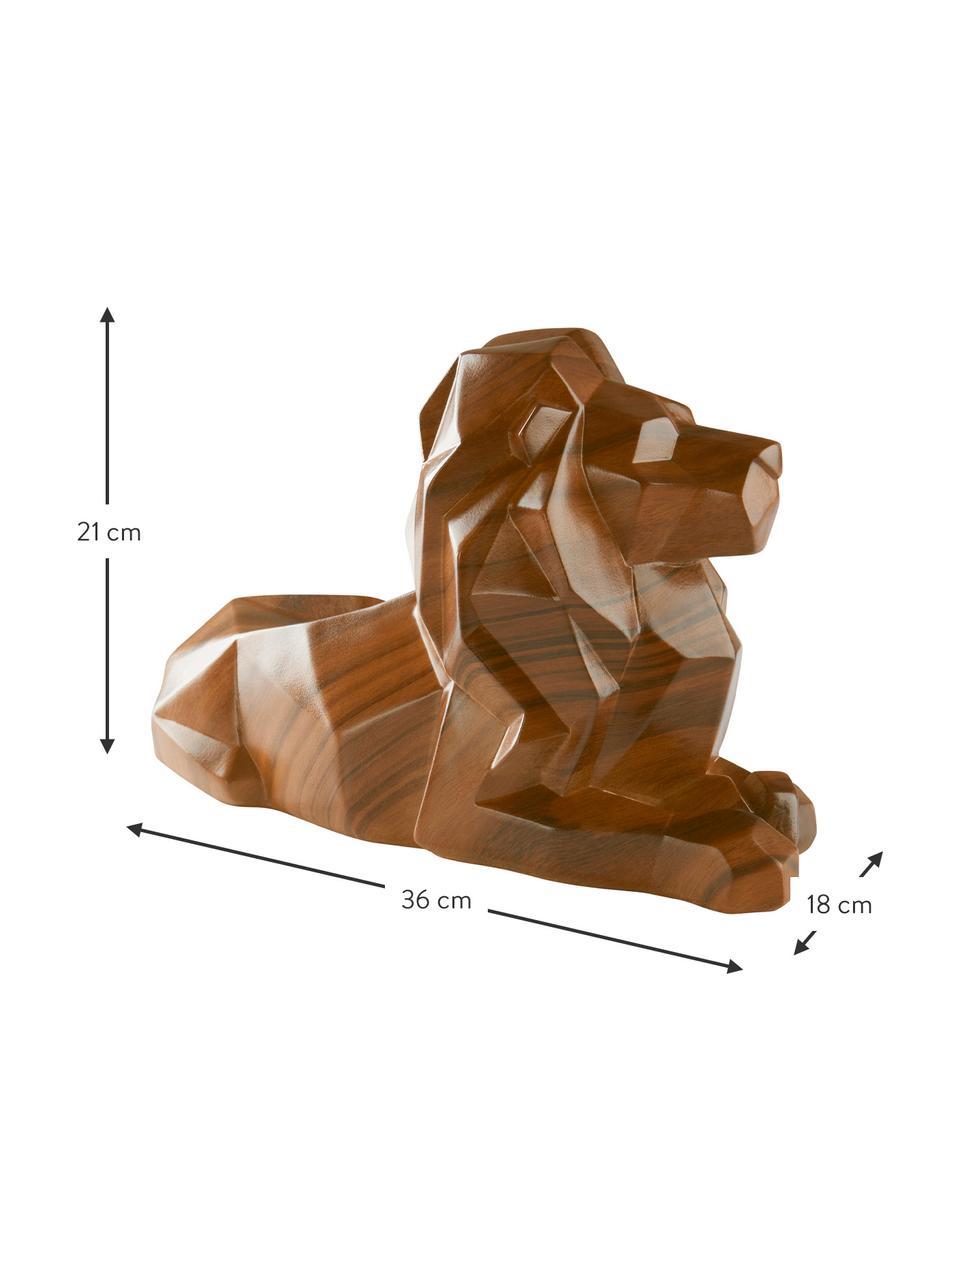 Deko-Objekt Drey, Kunststoff, Braun, 36 x 21 cm